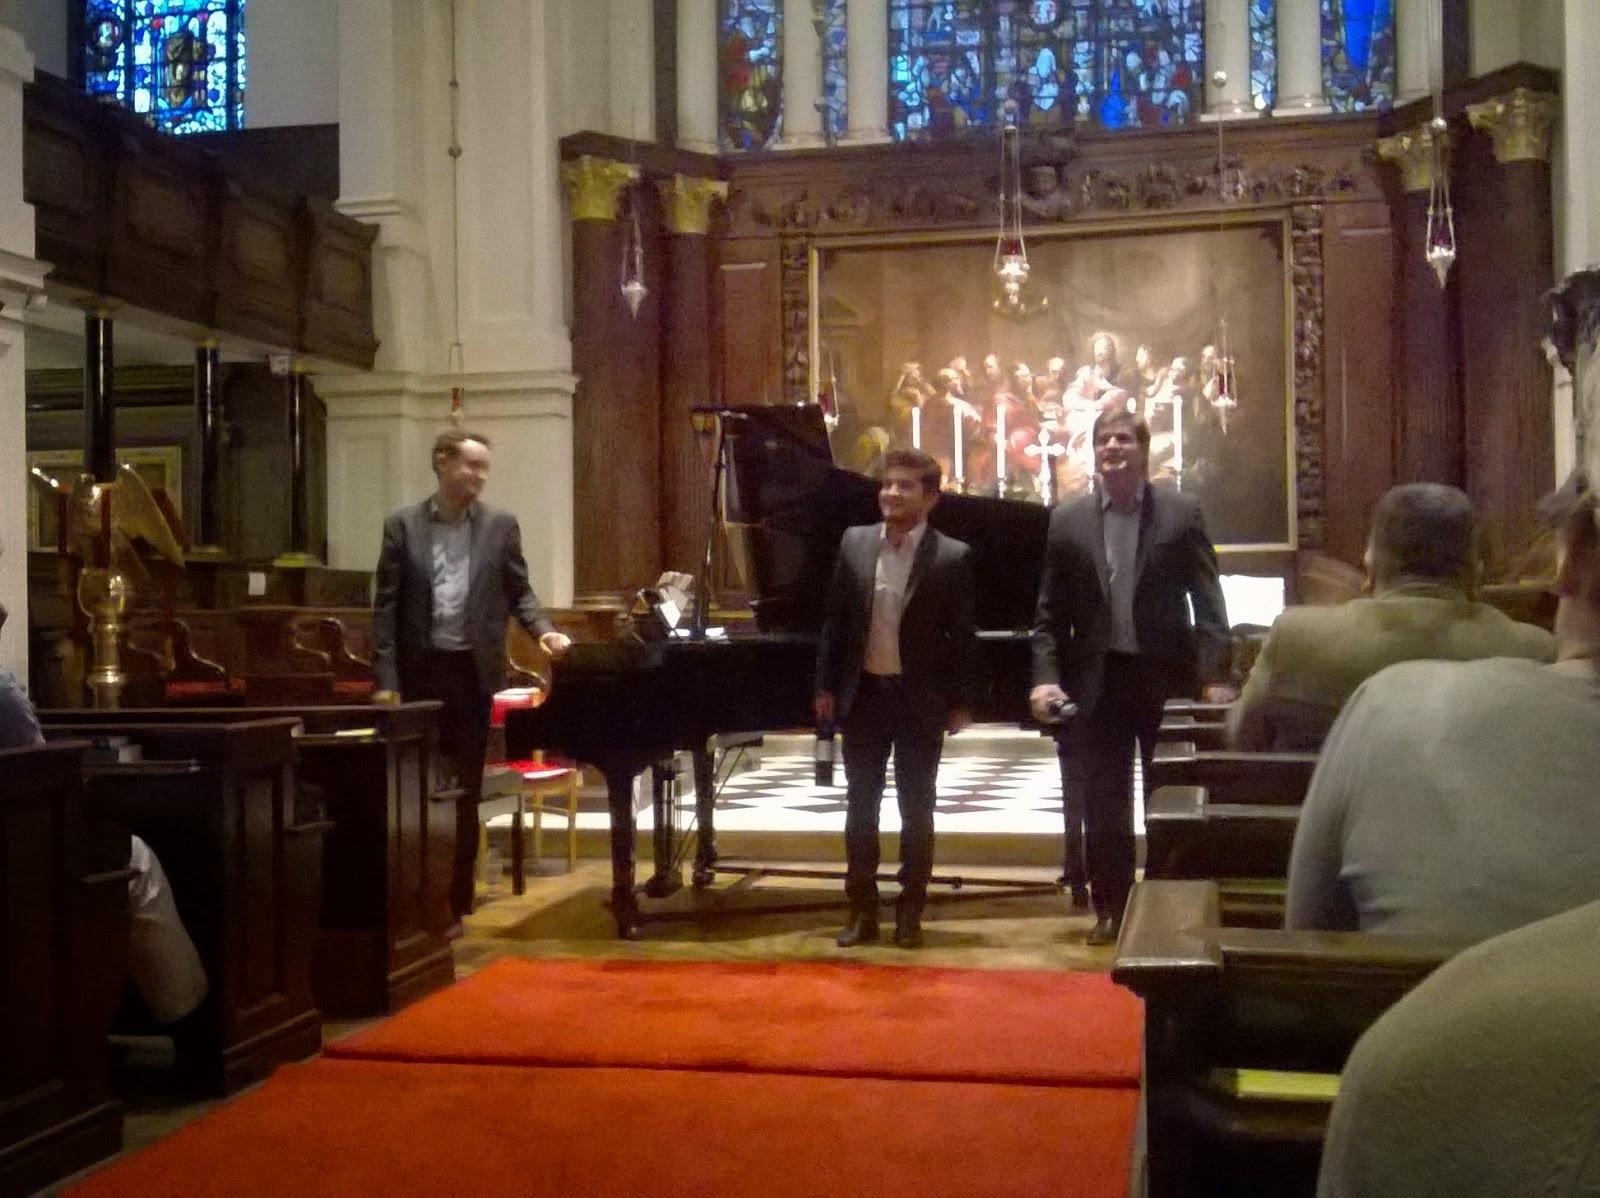 William Vann, David de Winter, and Gareth John